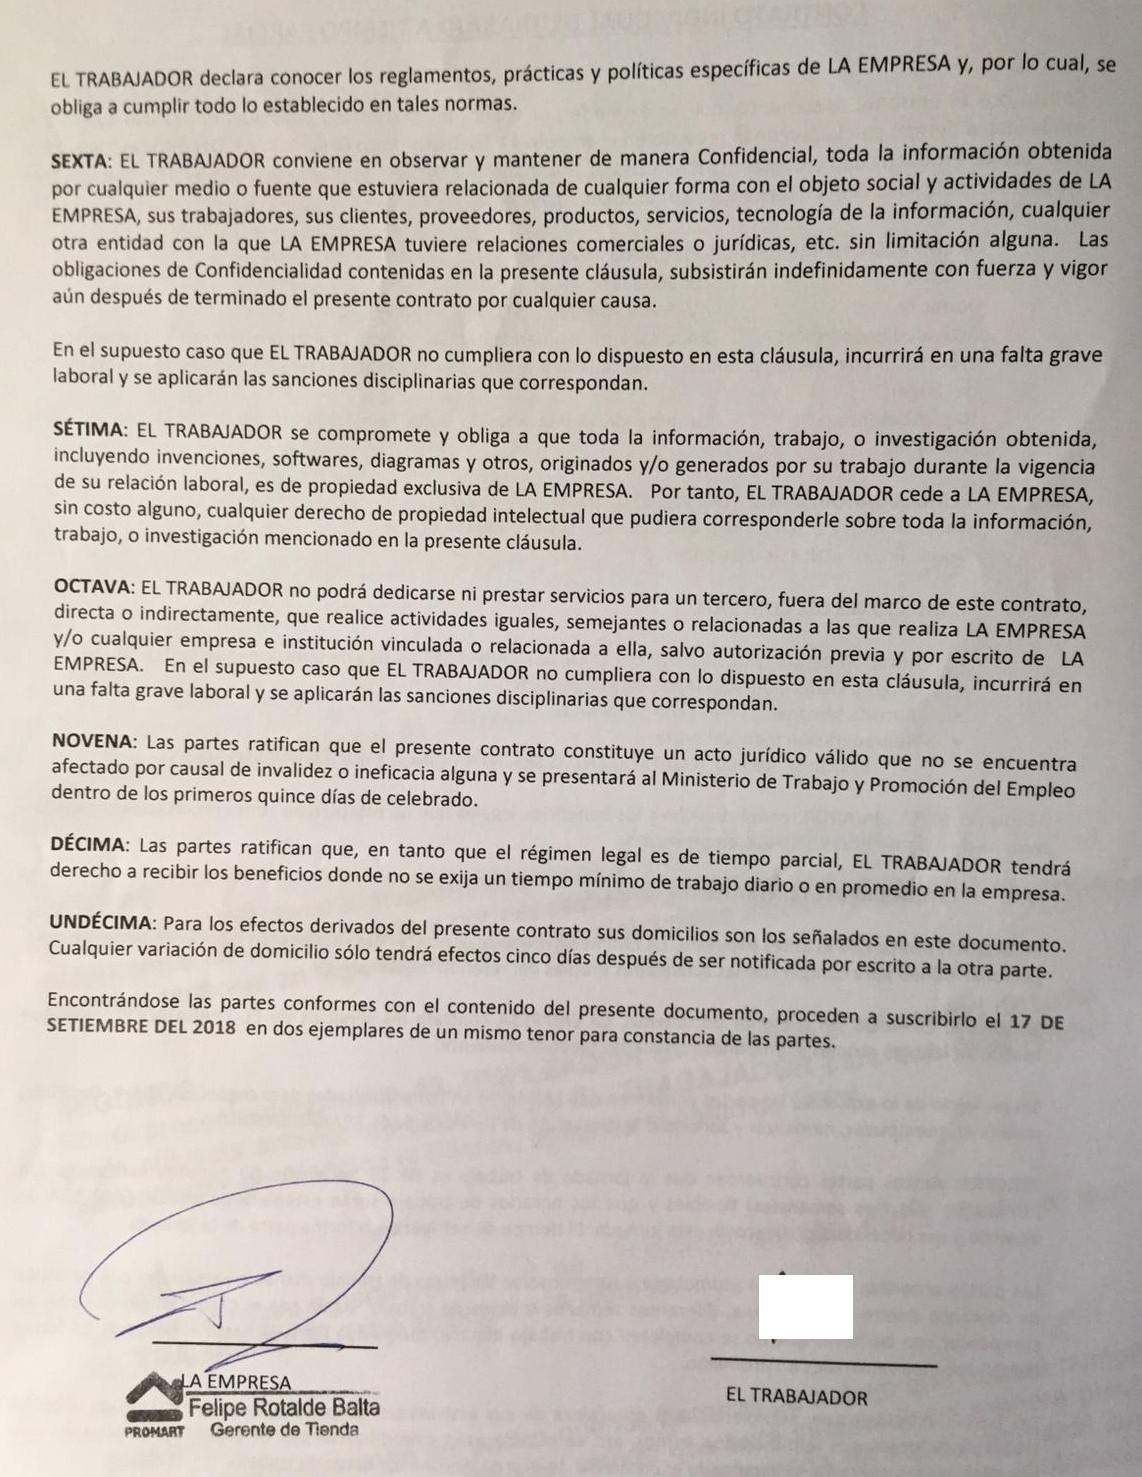 La segunda hoja del contrato de trabajo Promart